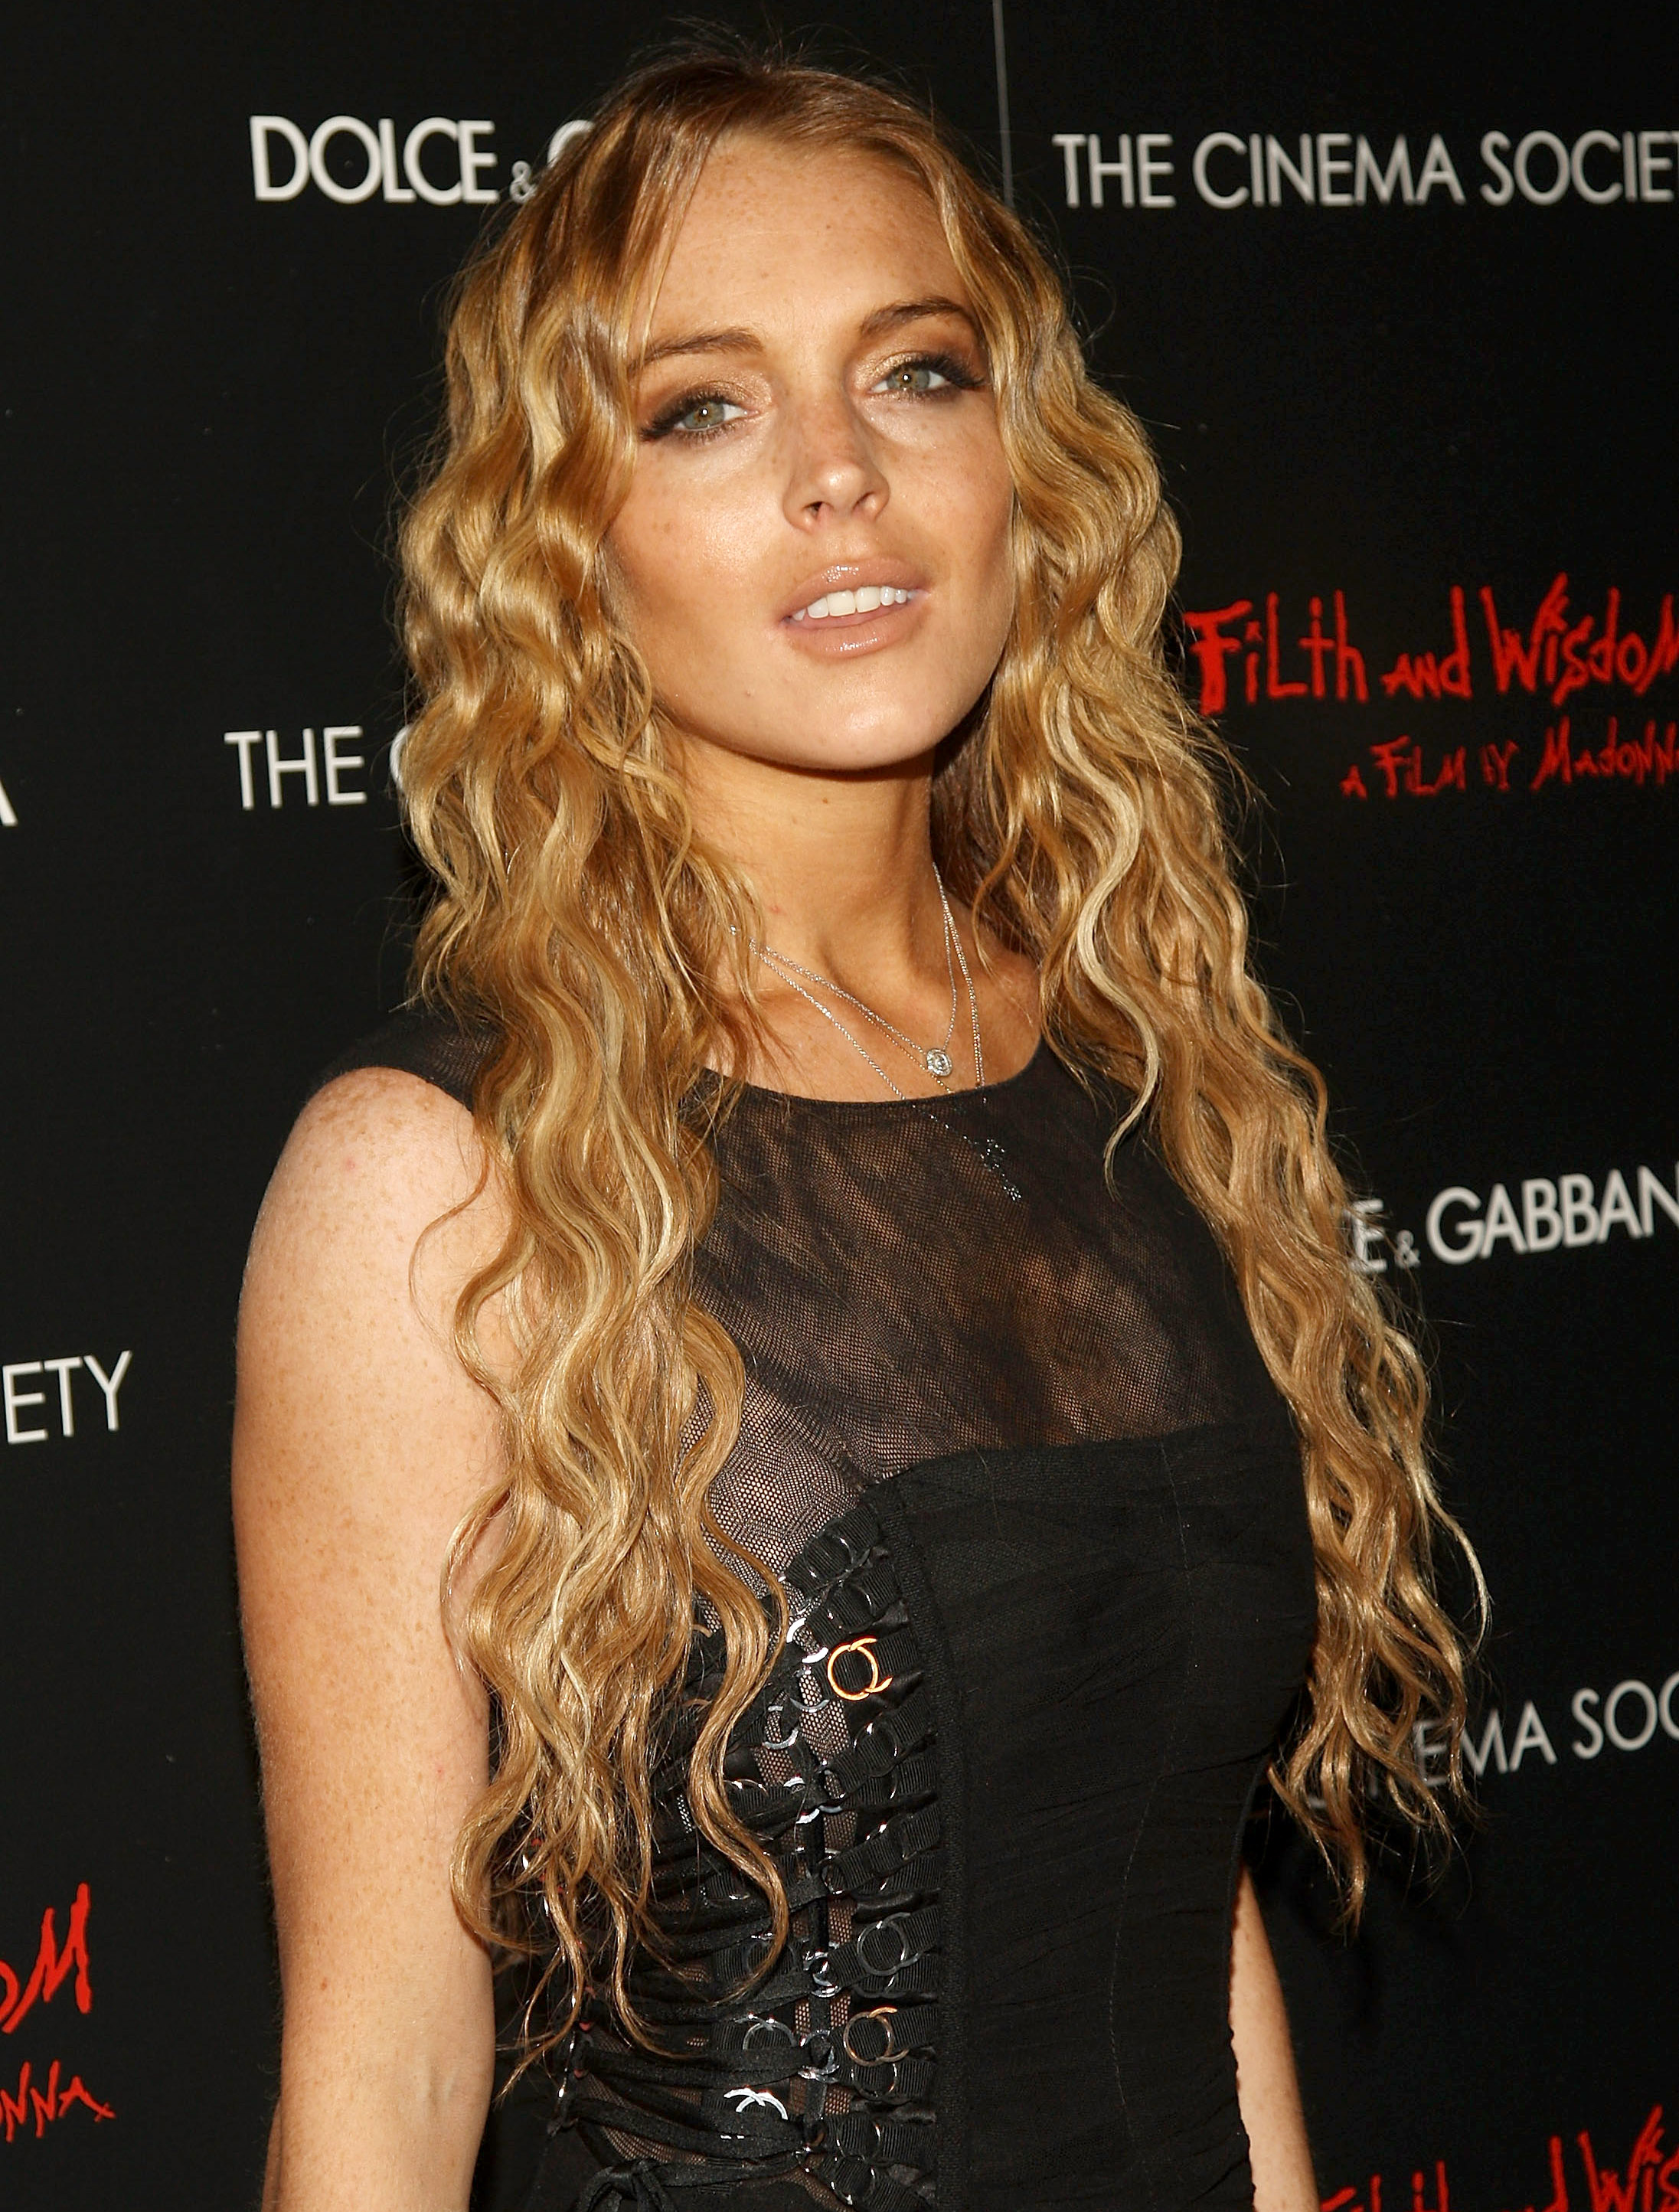 81692_Celebutopia-Lindsay_Lohan-Screening_of_Filth_and_Wisdom_in_New_York_City-10_122_1152lo.jpg